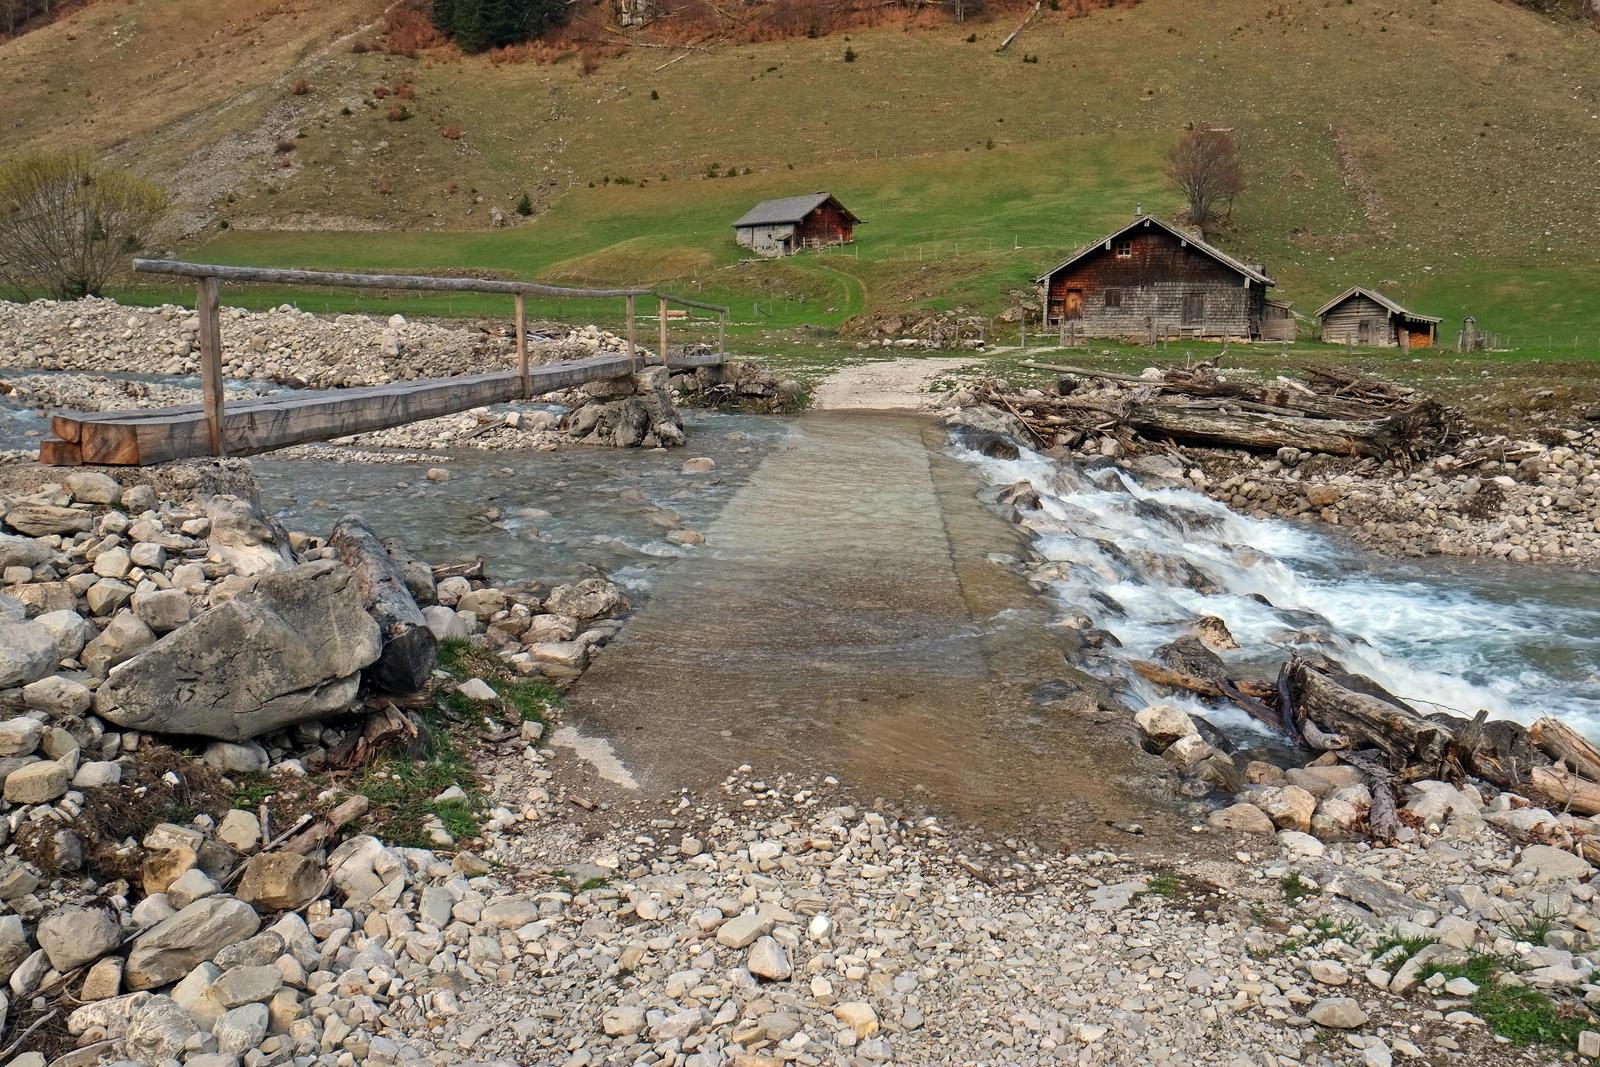 Through The River by Burtn